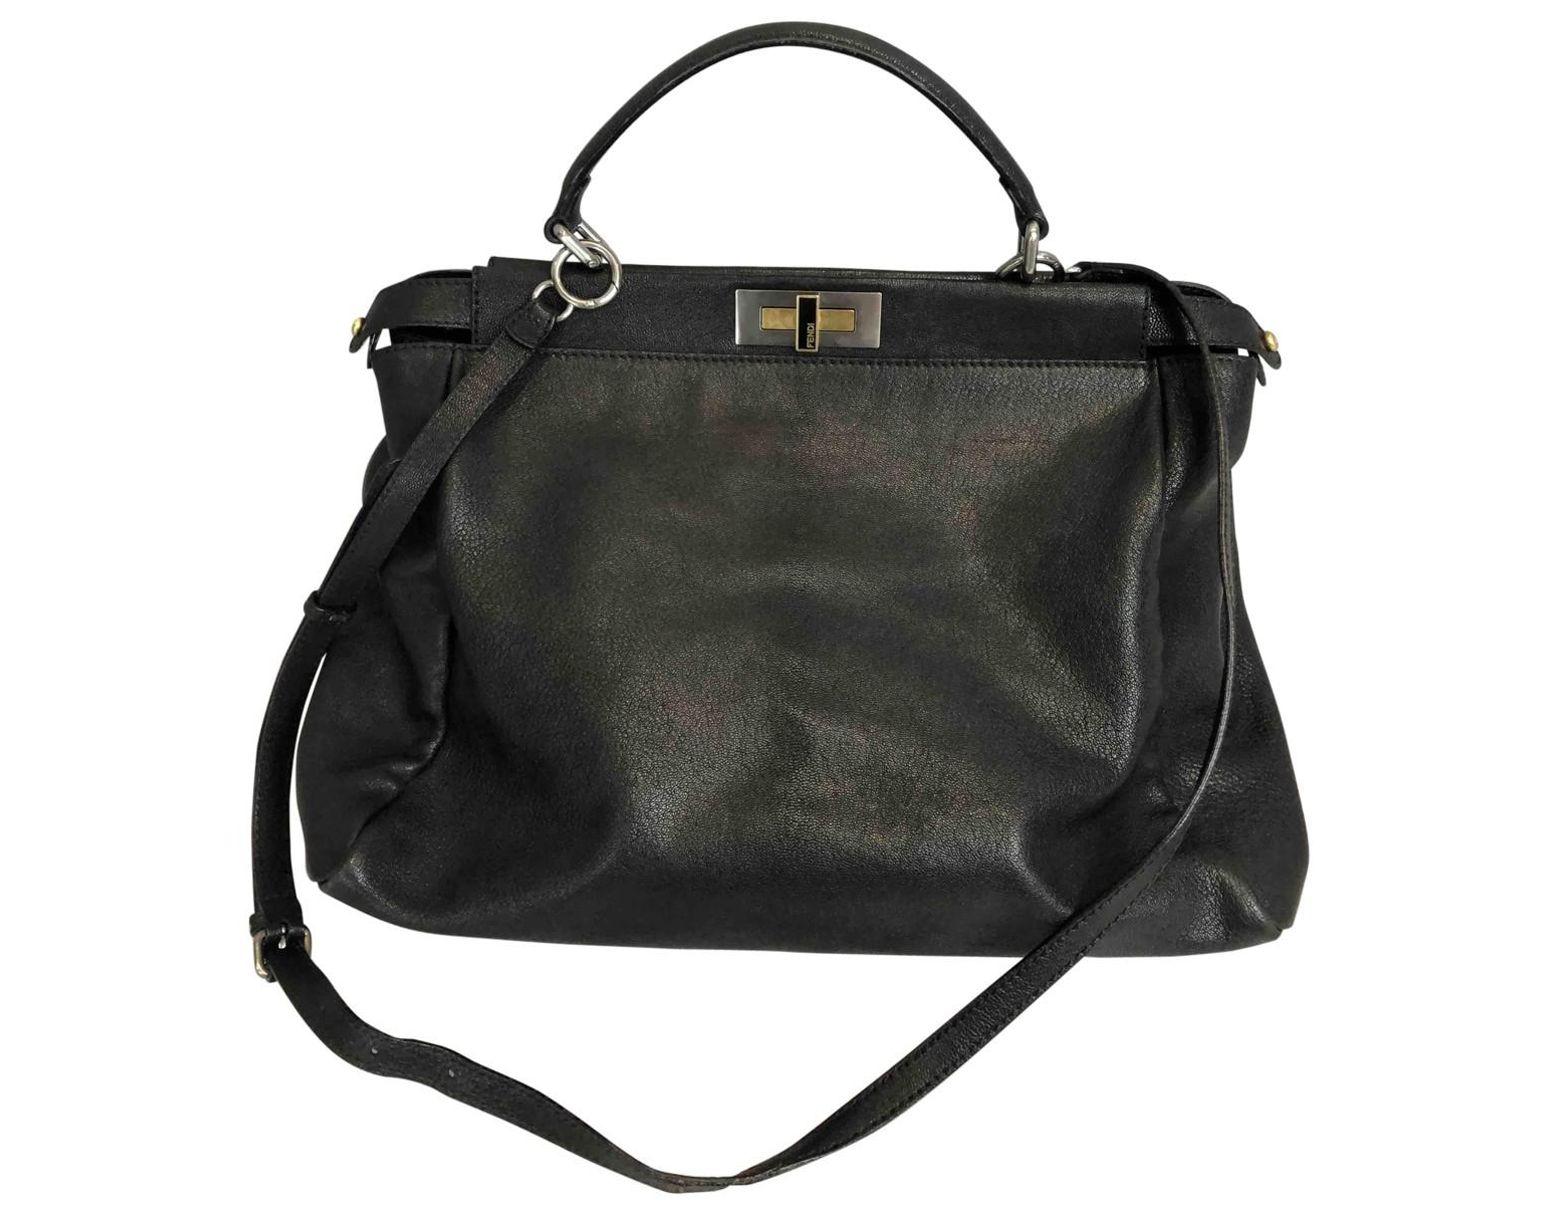 92004704 Fendi Peekaboo Leather Crossbody Bag in Black - Lyst